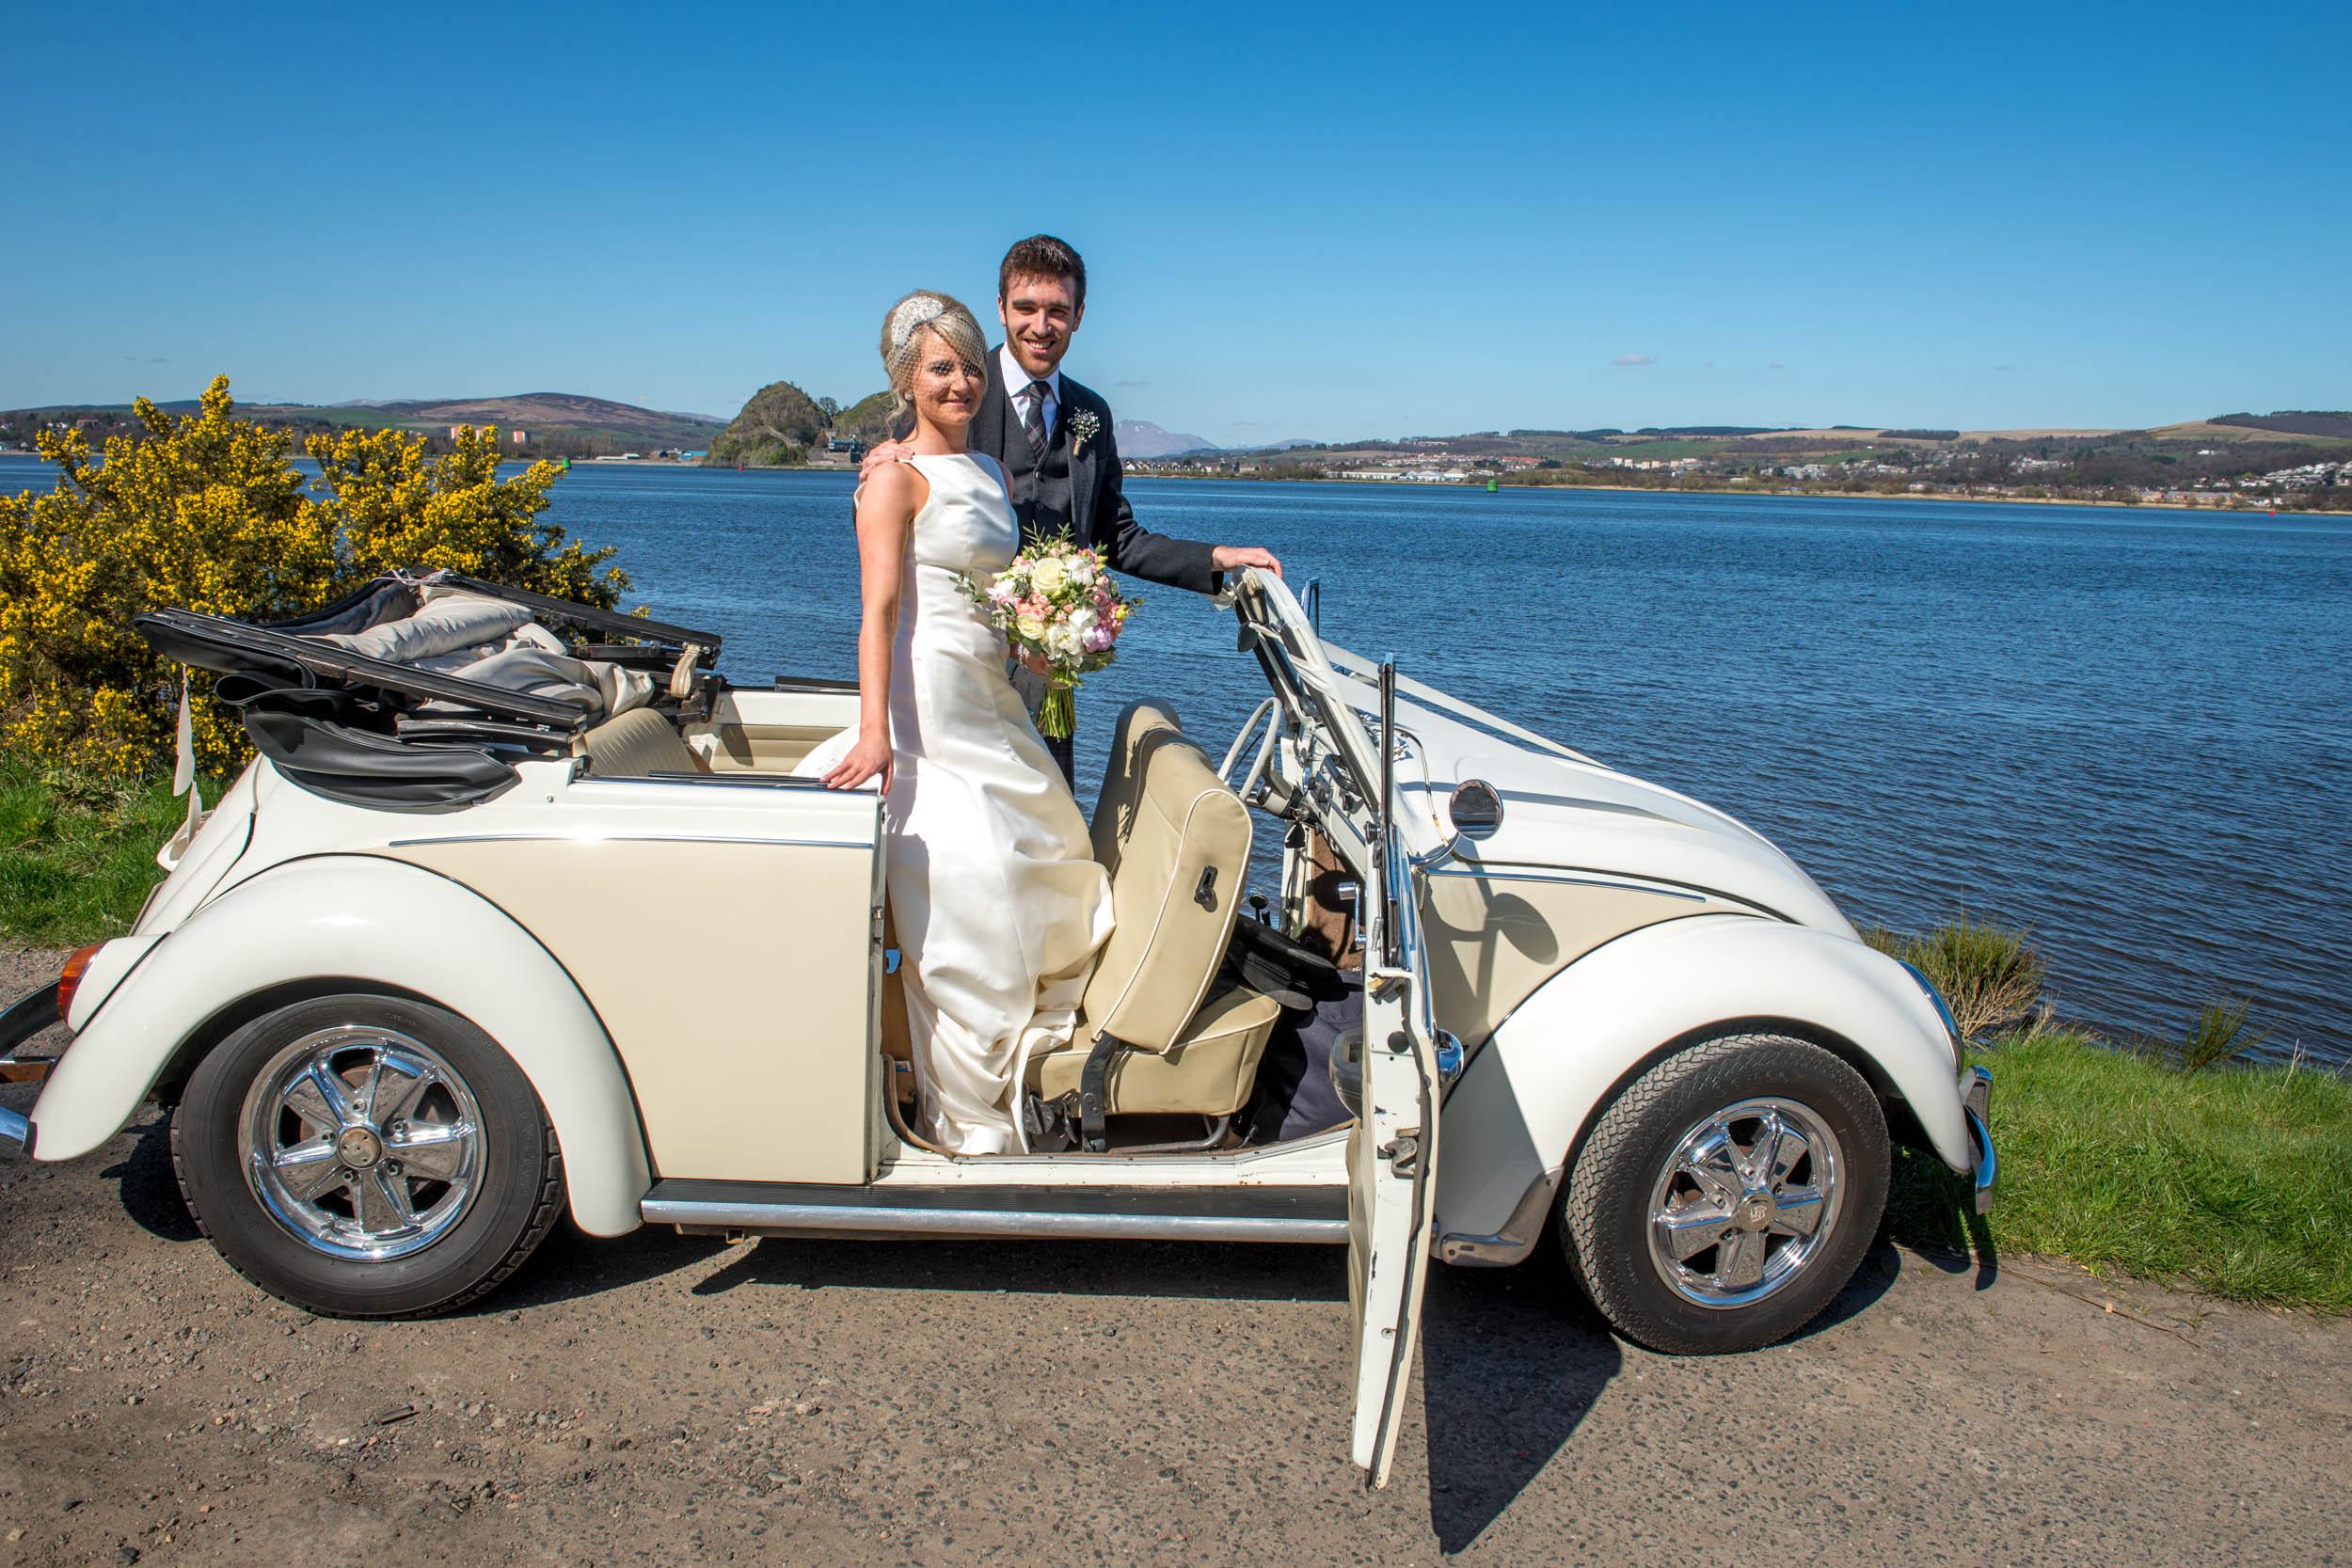 Paul-Saunders-Wedding-Photography-9282.jpg